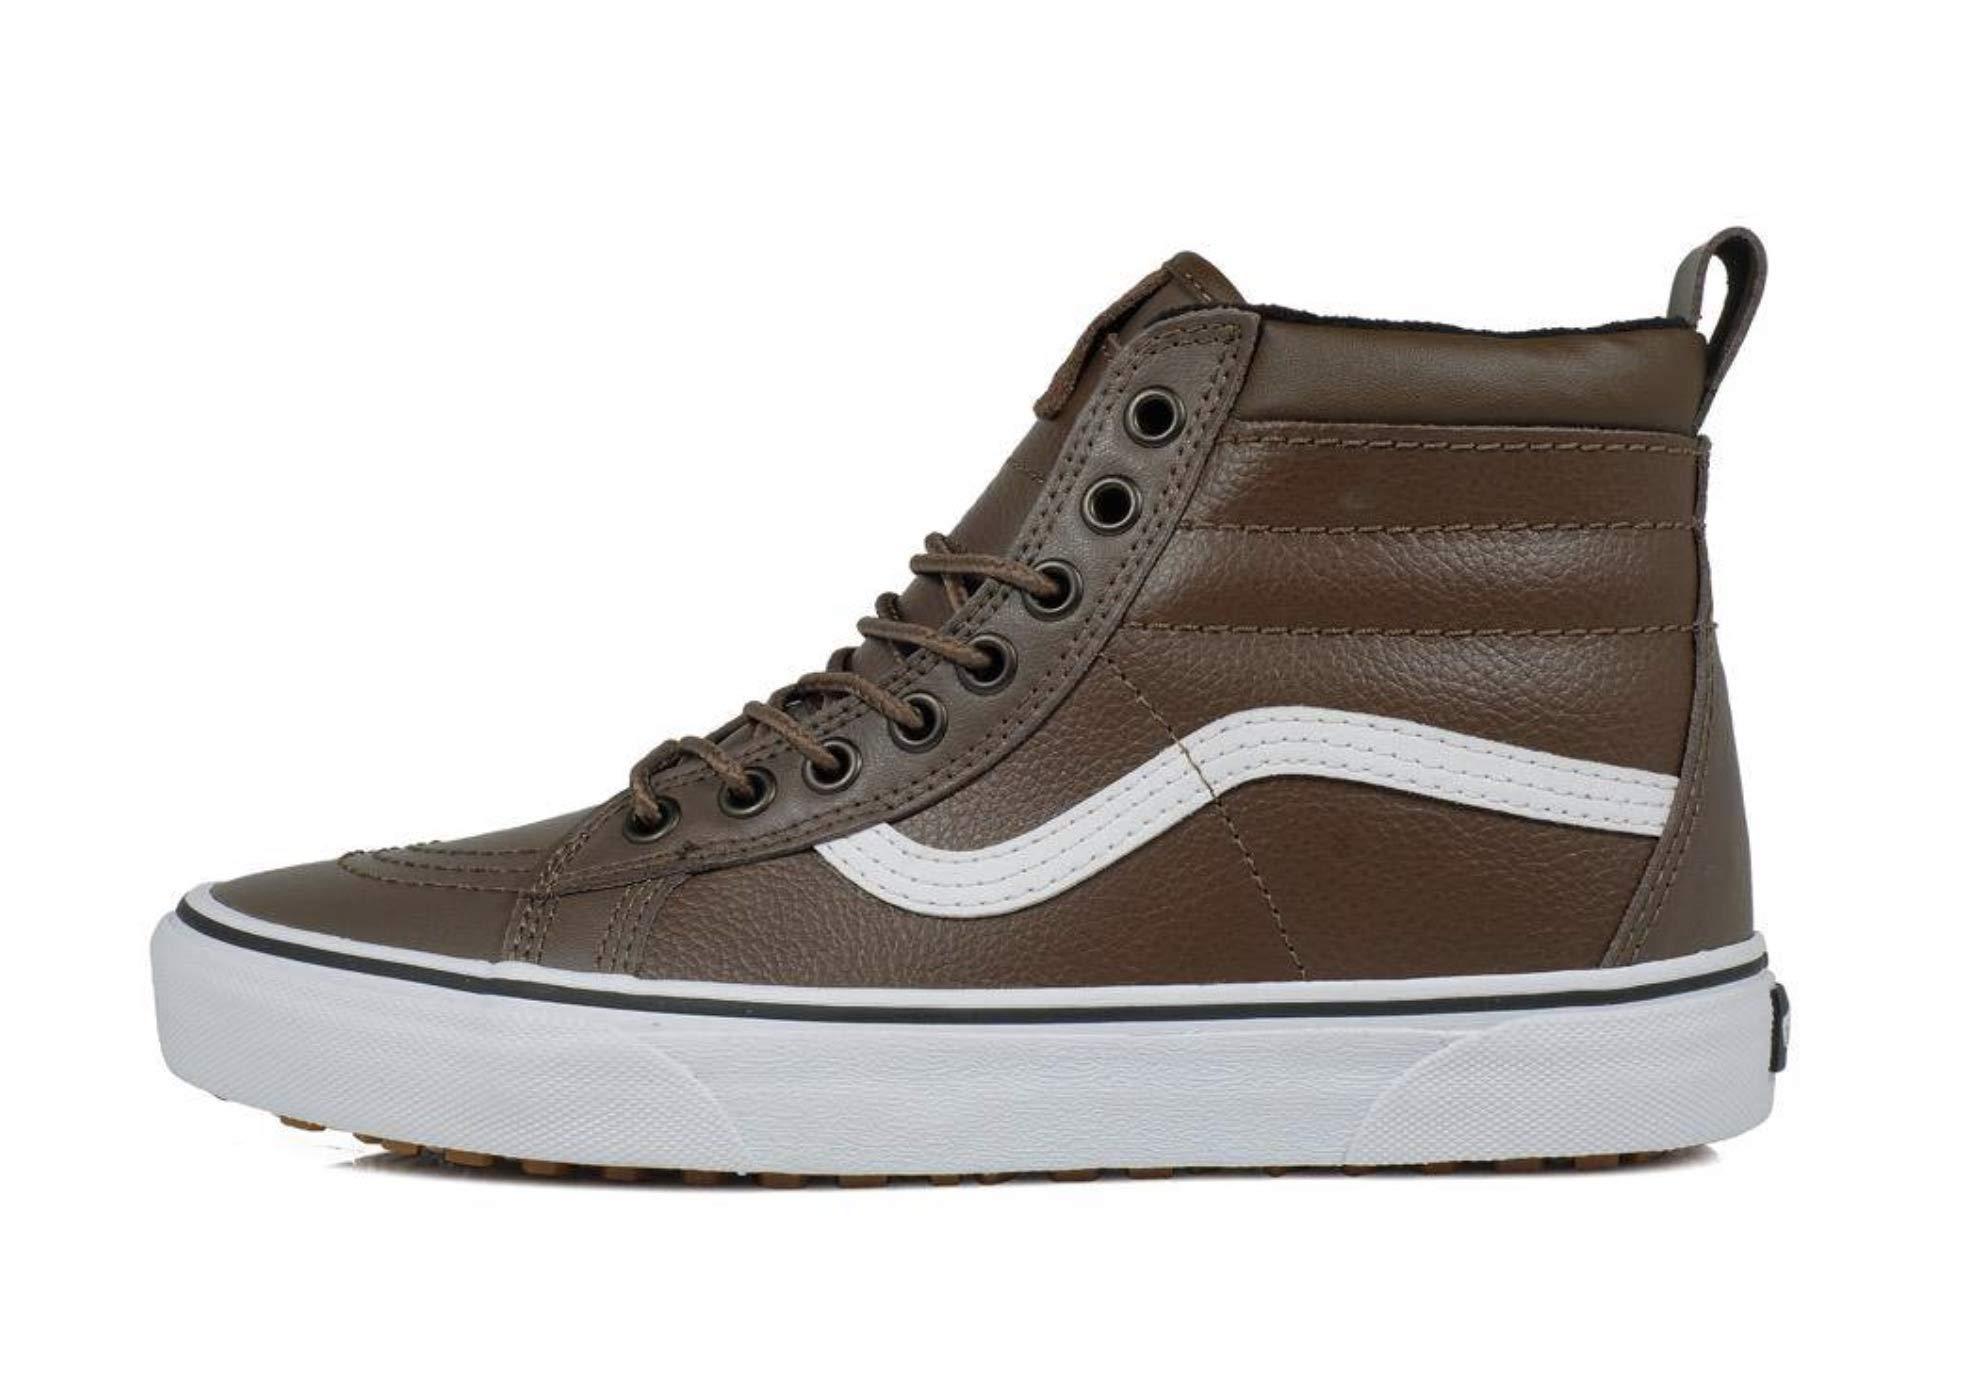 39acfa5f449ece Galleon - Vans Men s Sk8-Hi MTE Leather Skate Shoe (8 M US